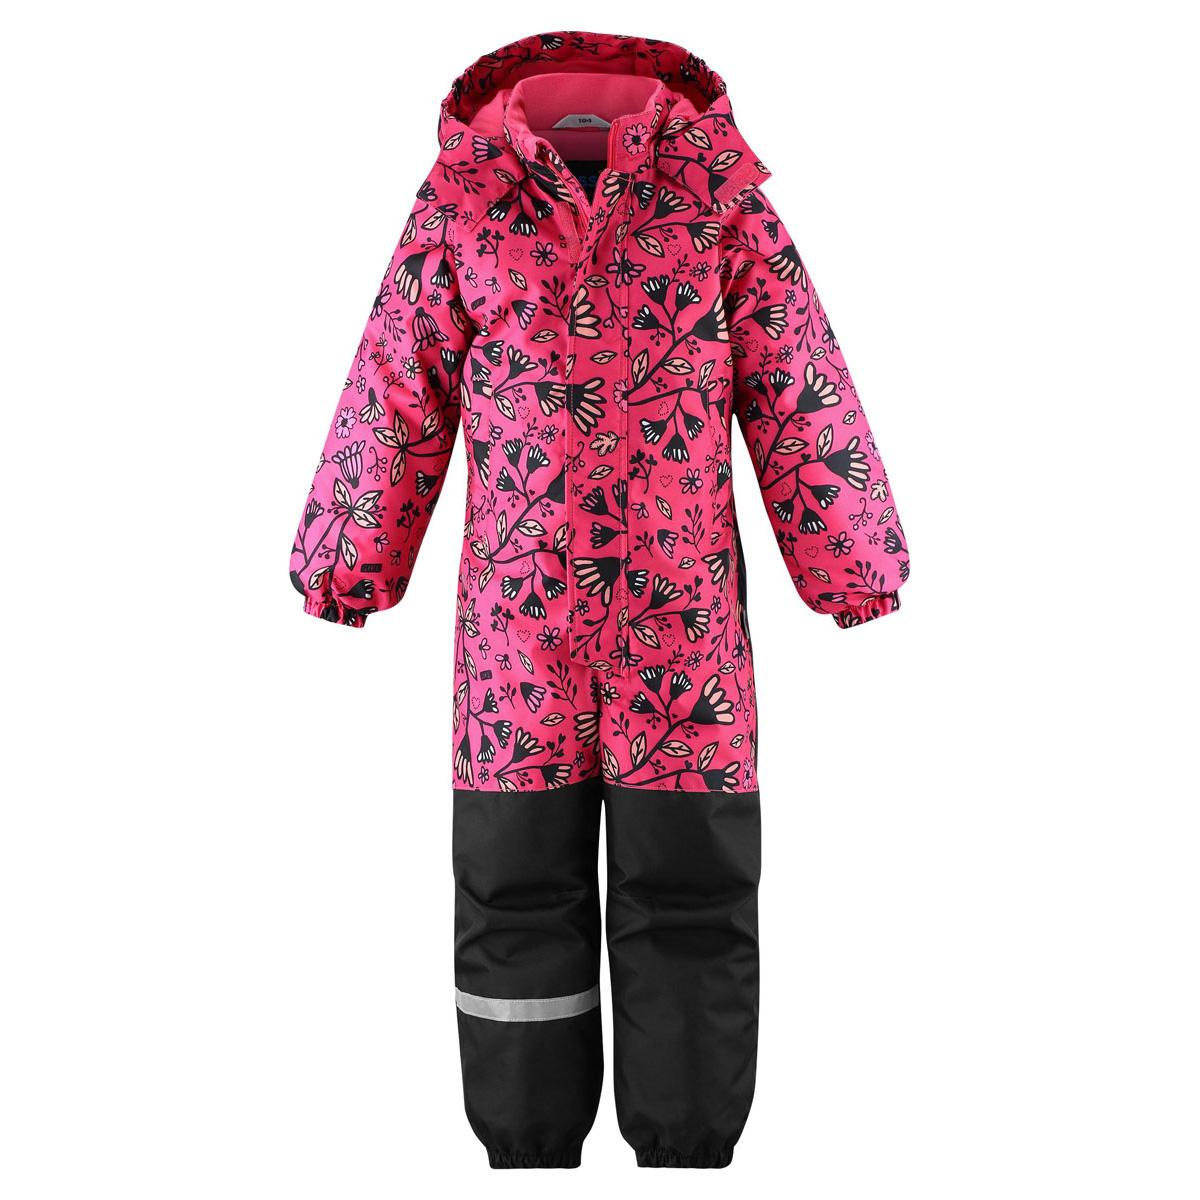 Купить Комбинезон для девочки Siiko Lassie, Размер 104, 720733-4637_104,